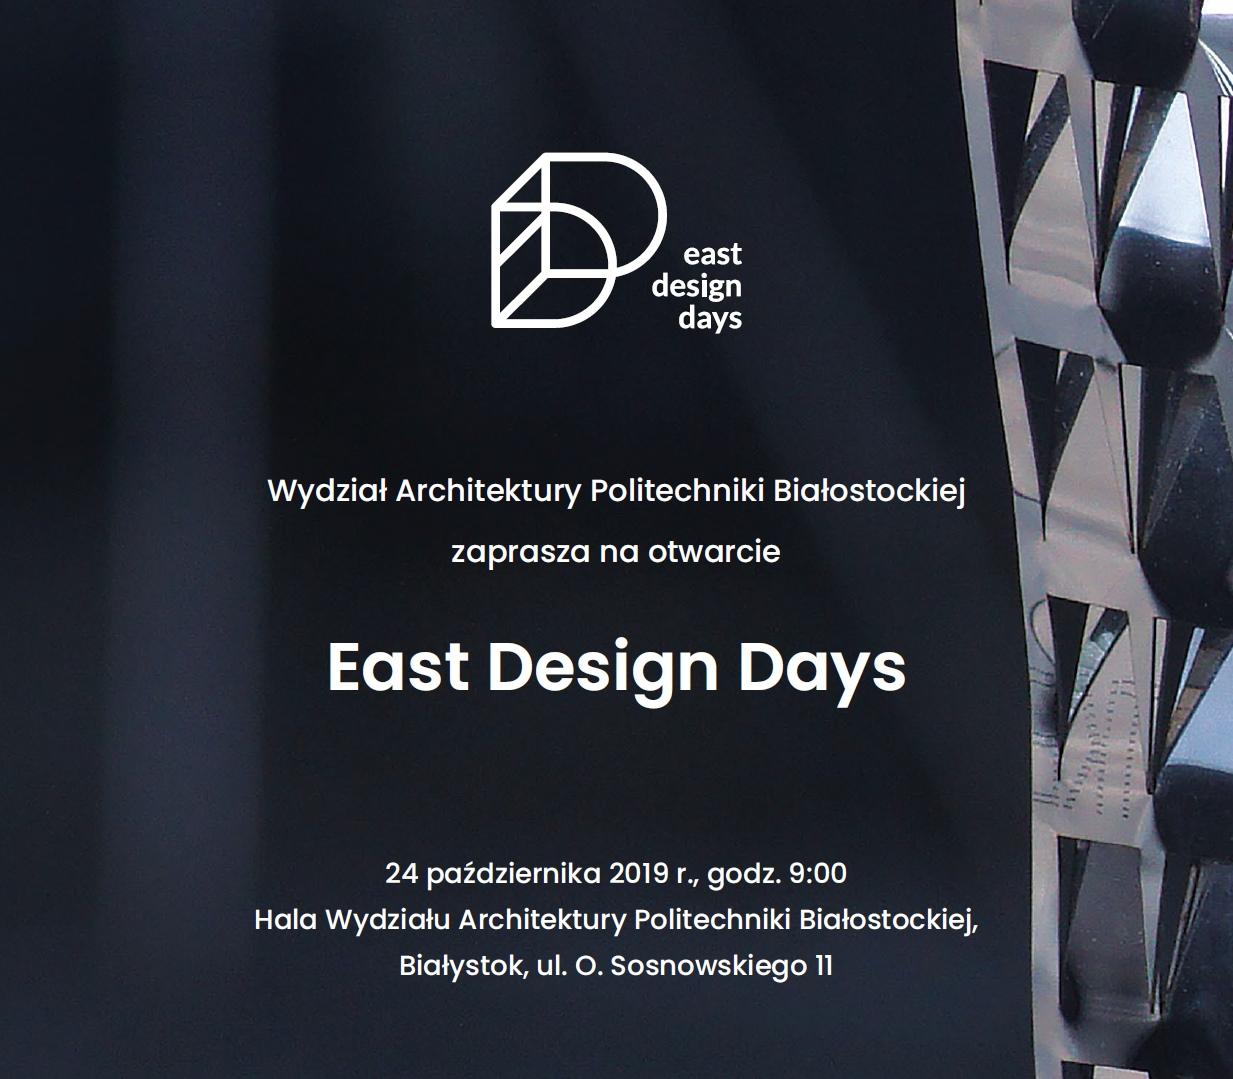 Zaproszenie_East_Design_Day_Tobo_Datczuk.jpg